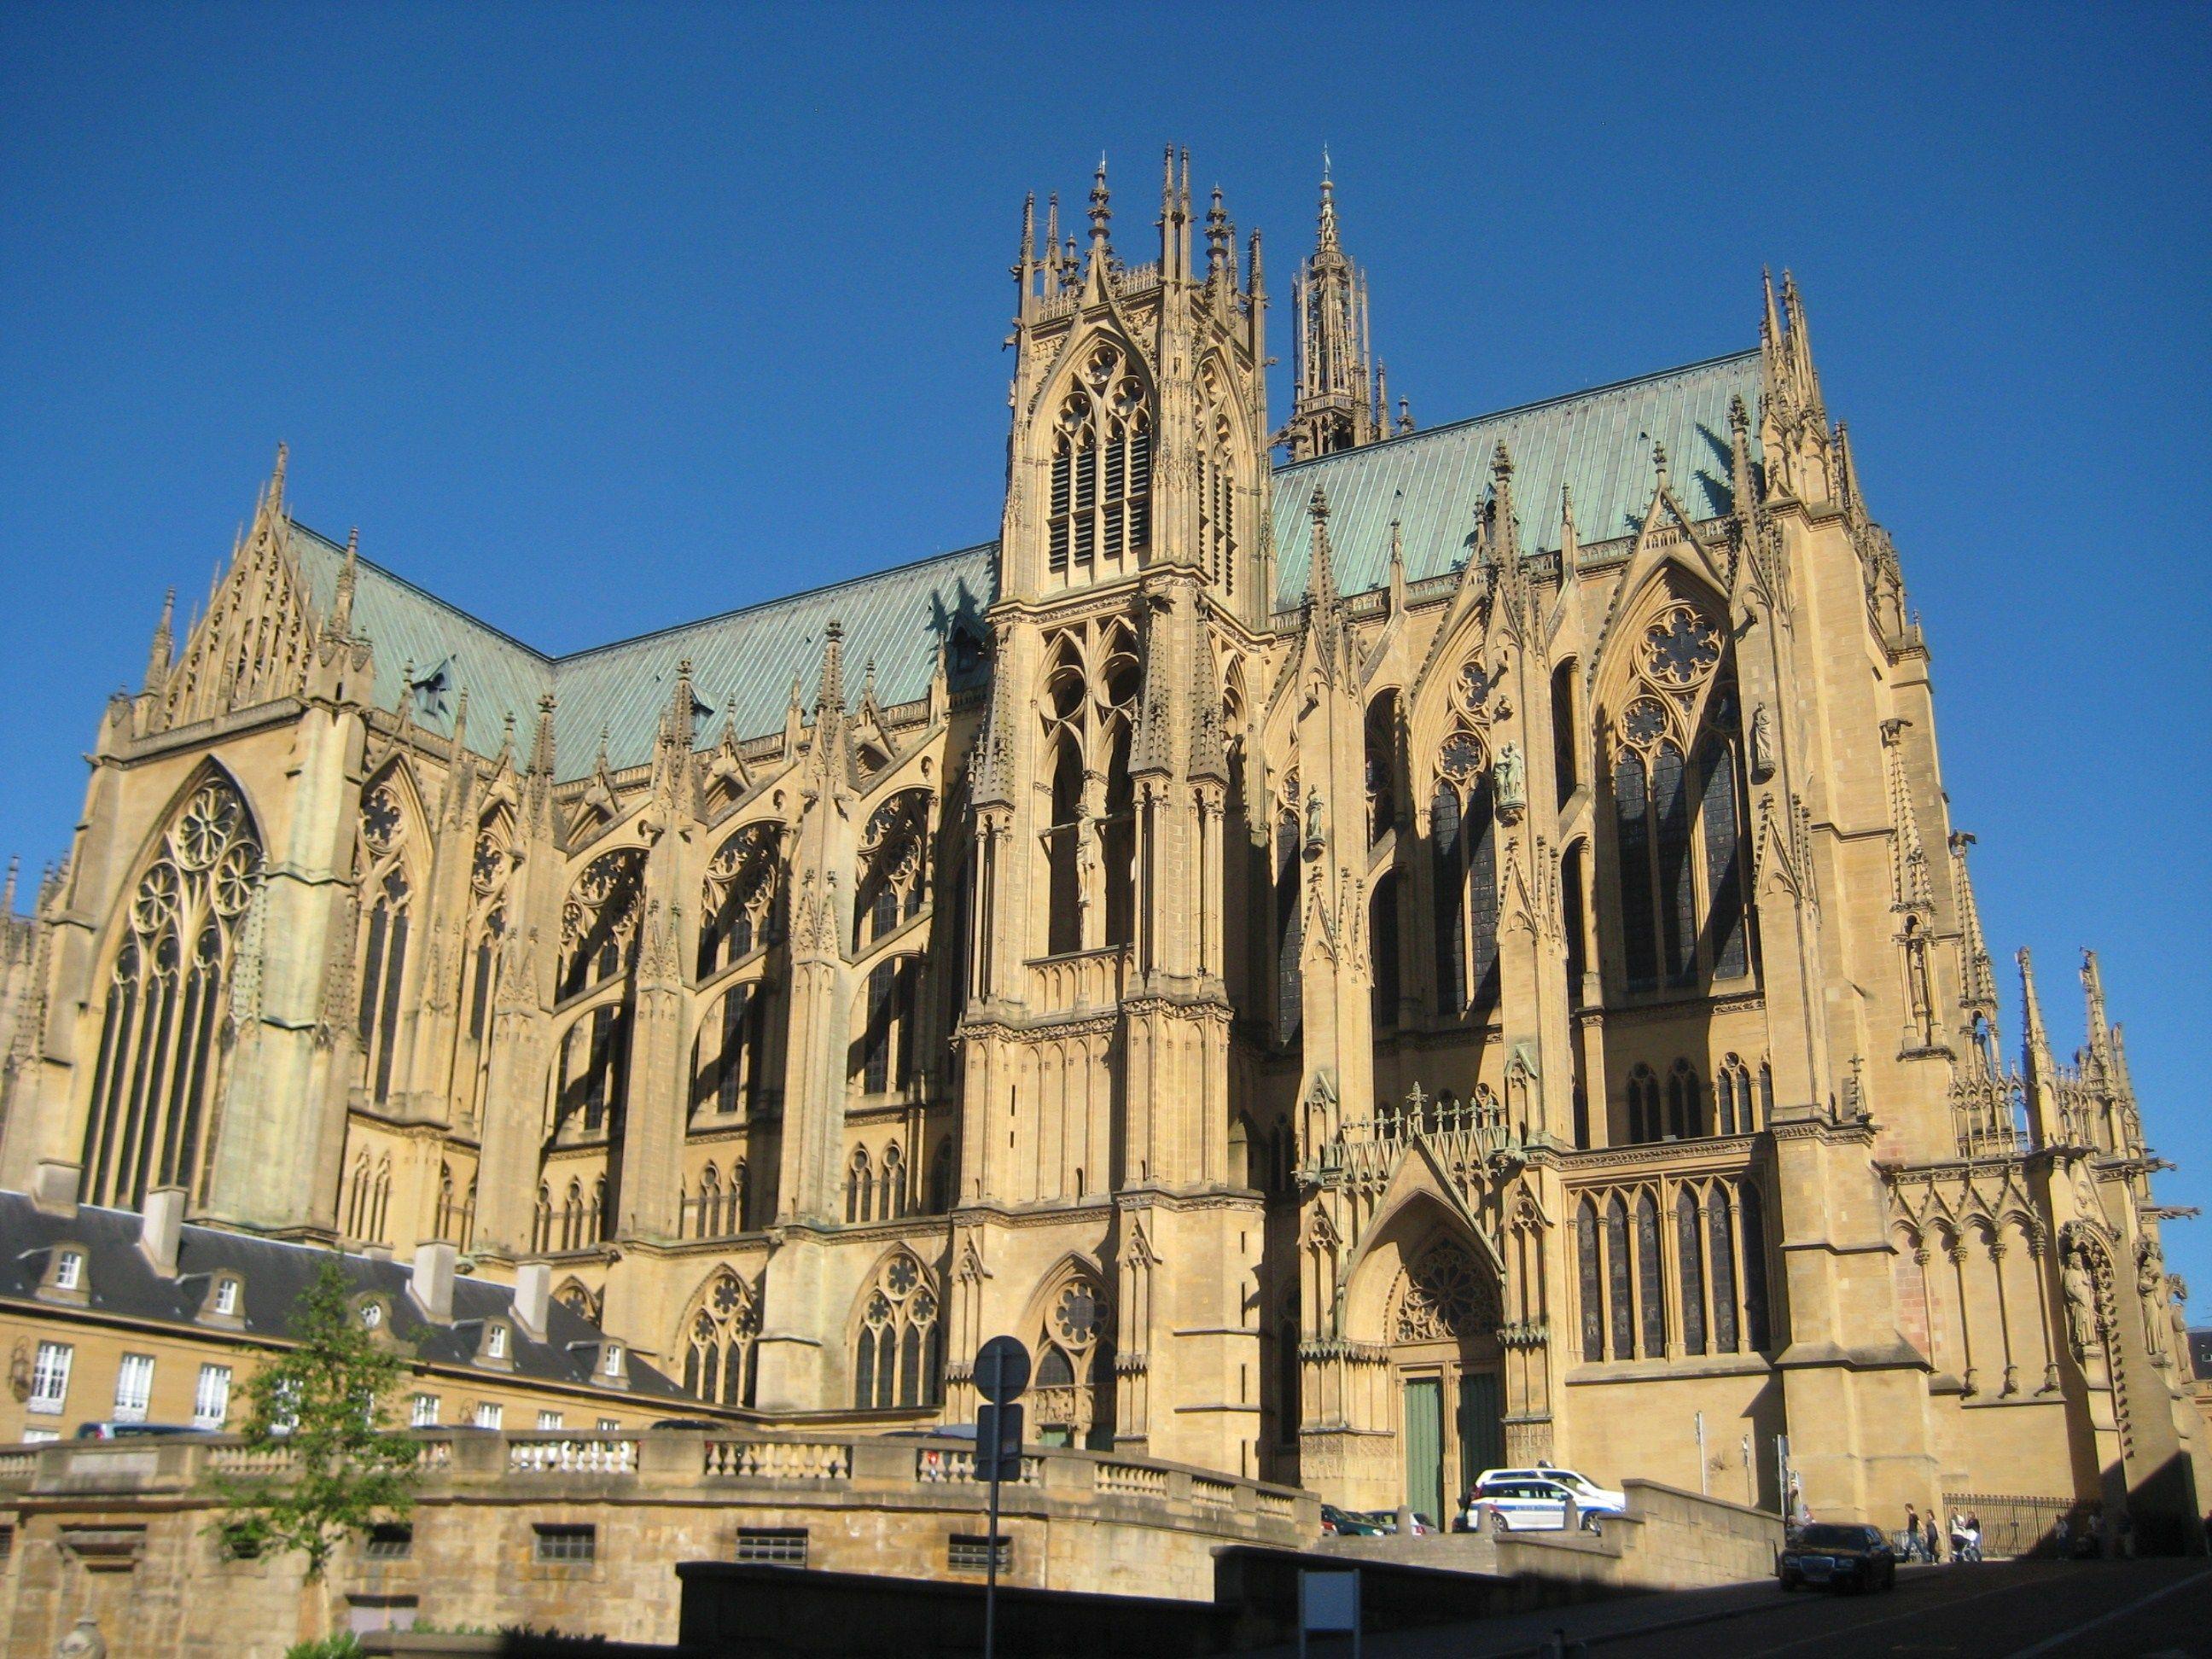 Metz cathedral metz france france pinterest for Maison d en france metz